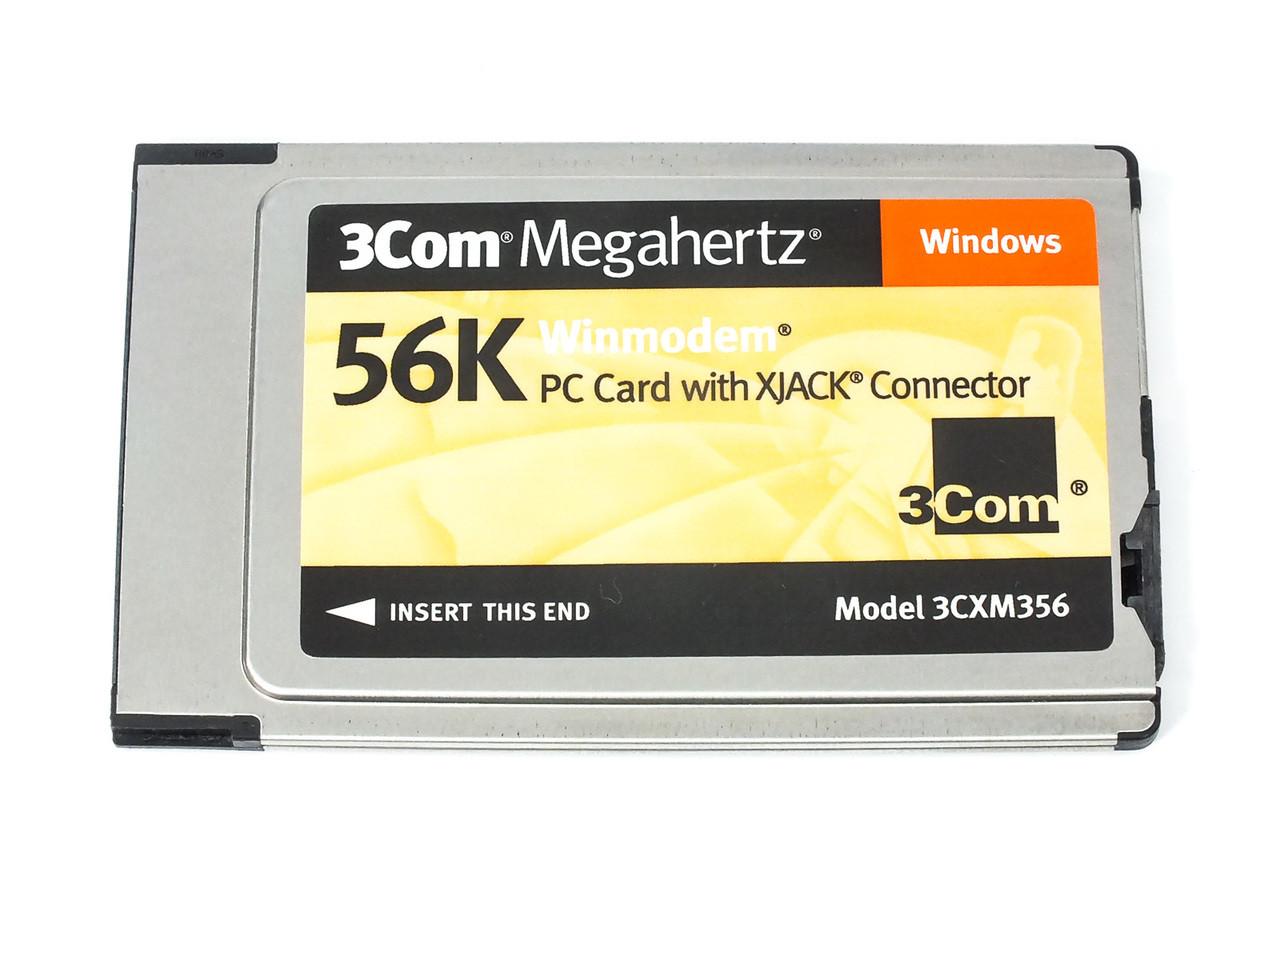 3COM MEGAHERTZ 3CXM356 Modem Download Drivers